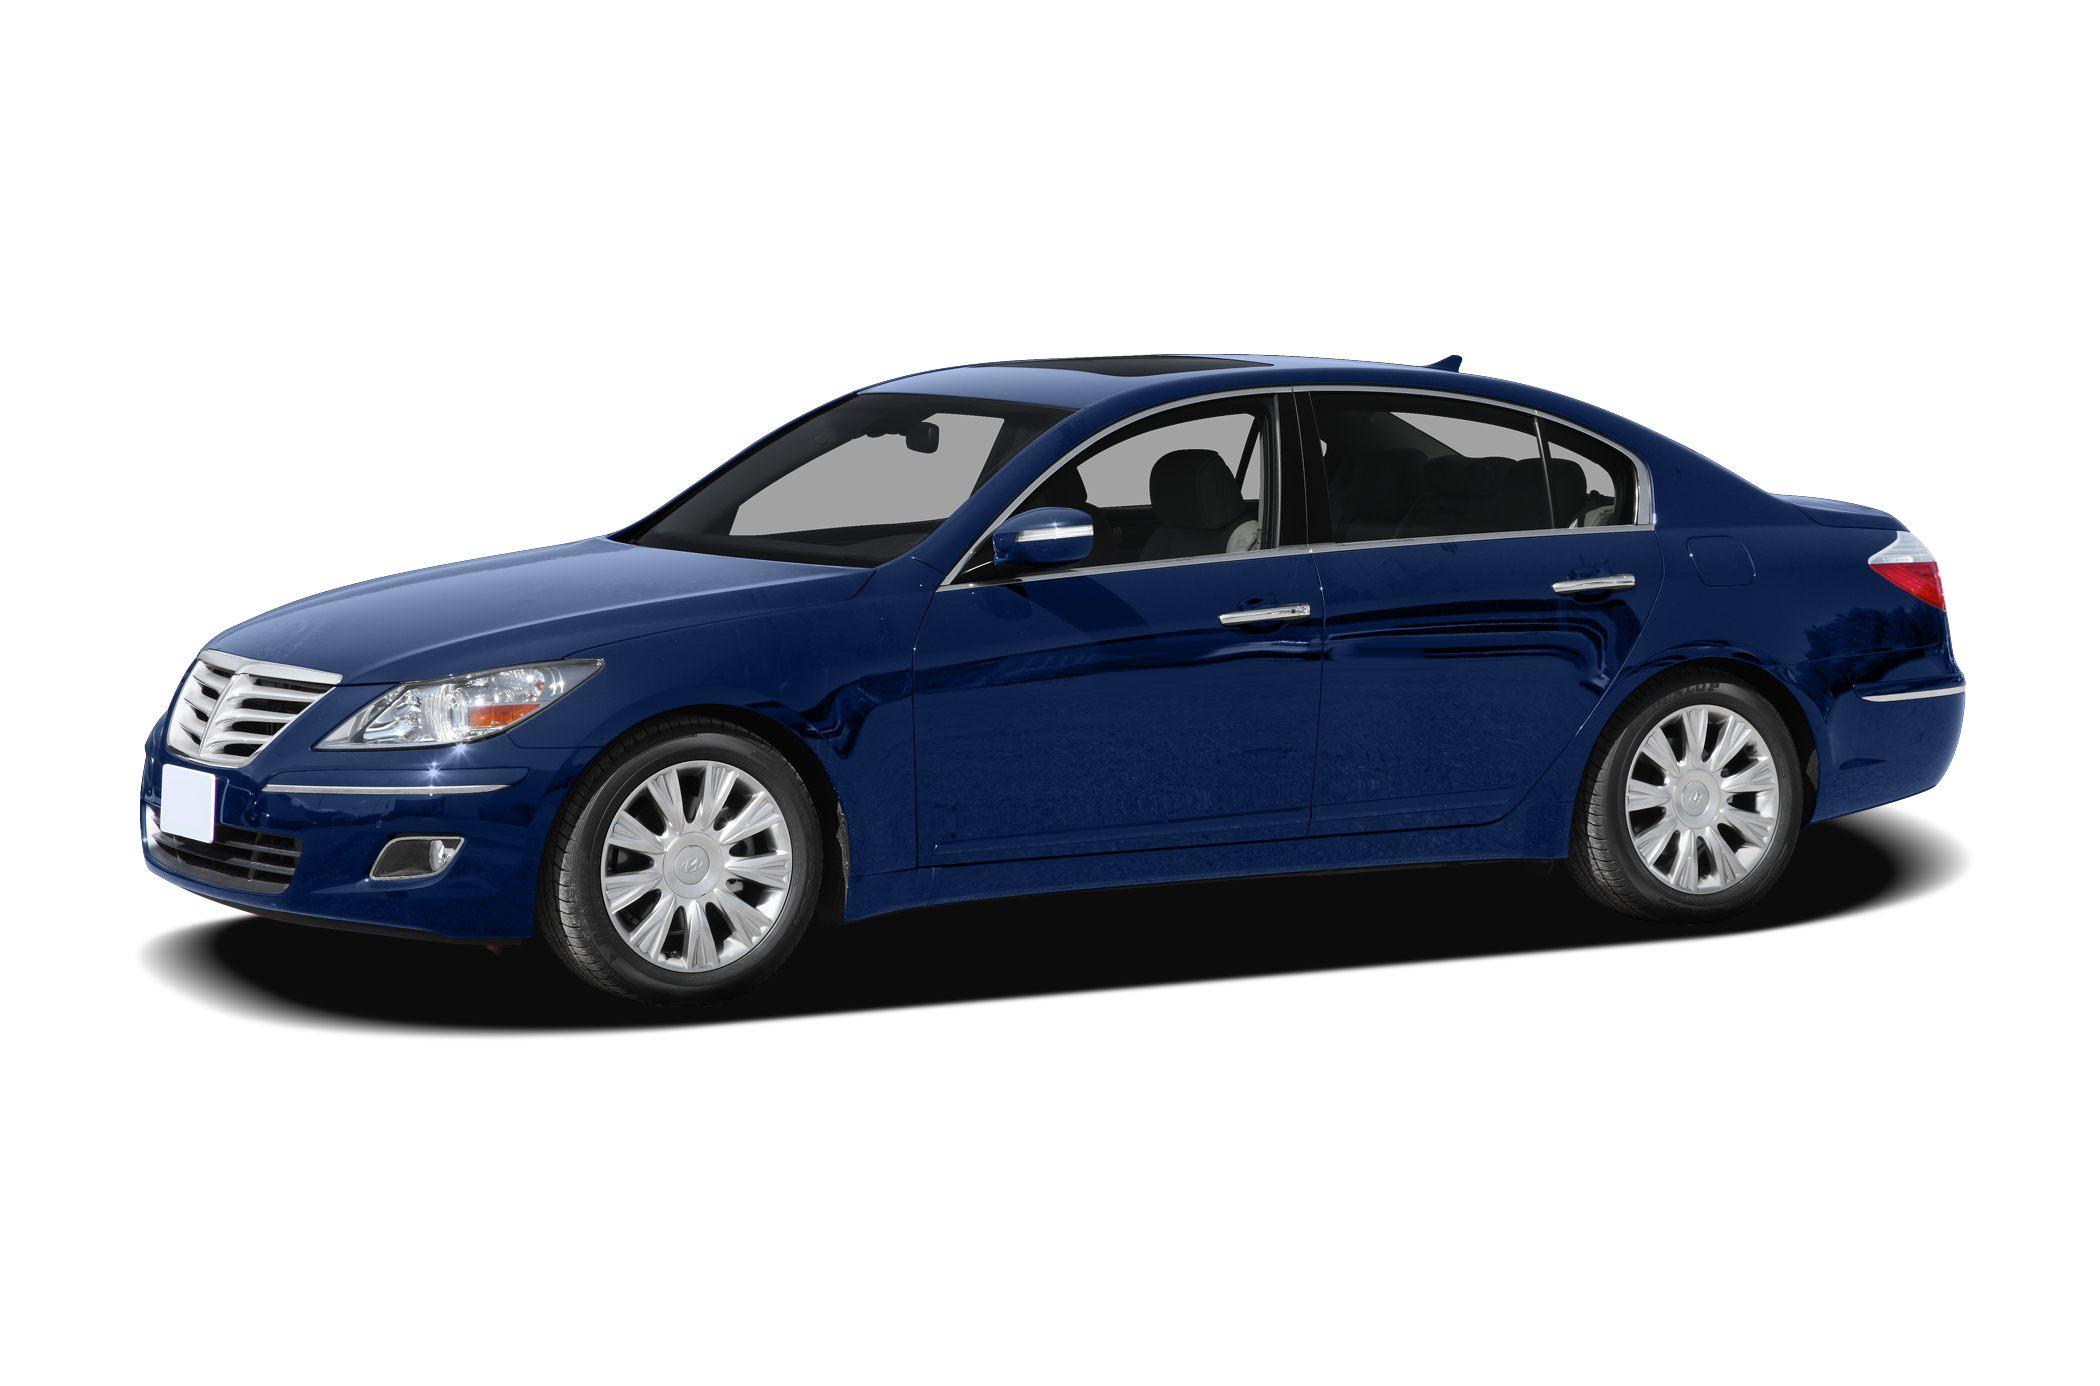 2010 Hyundai Genesis 4.6 Sedan for sale in Apopka for $17,000 with 65,328 miles.